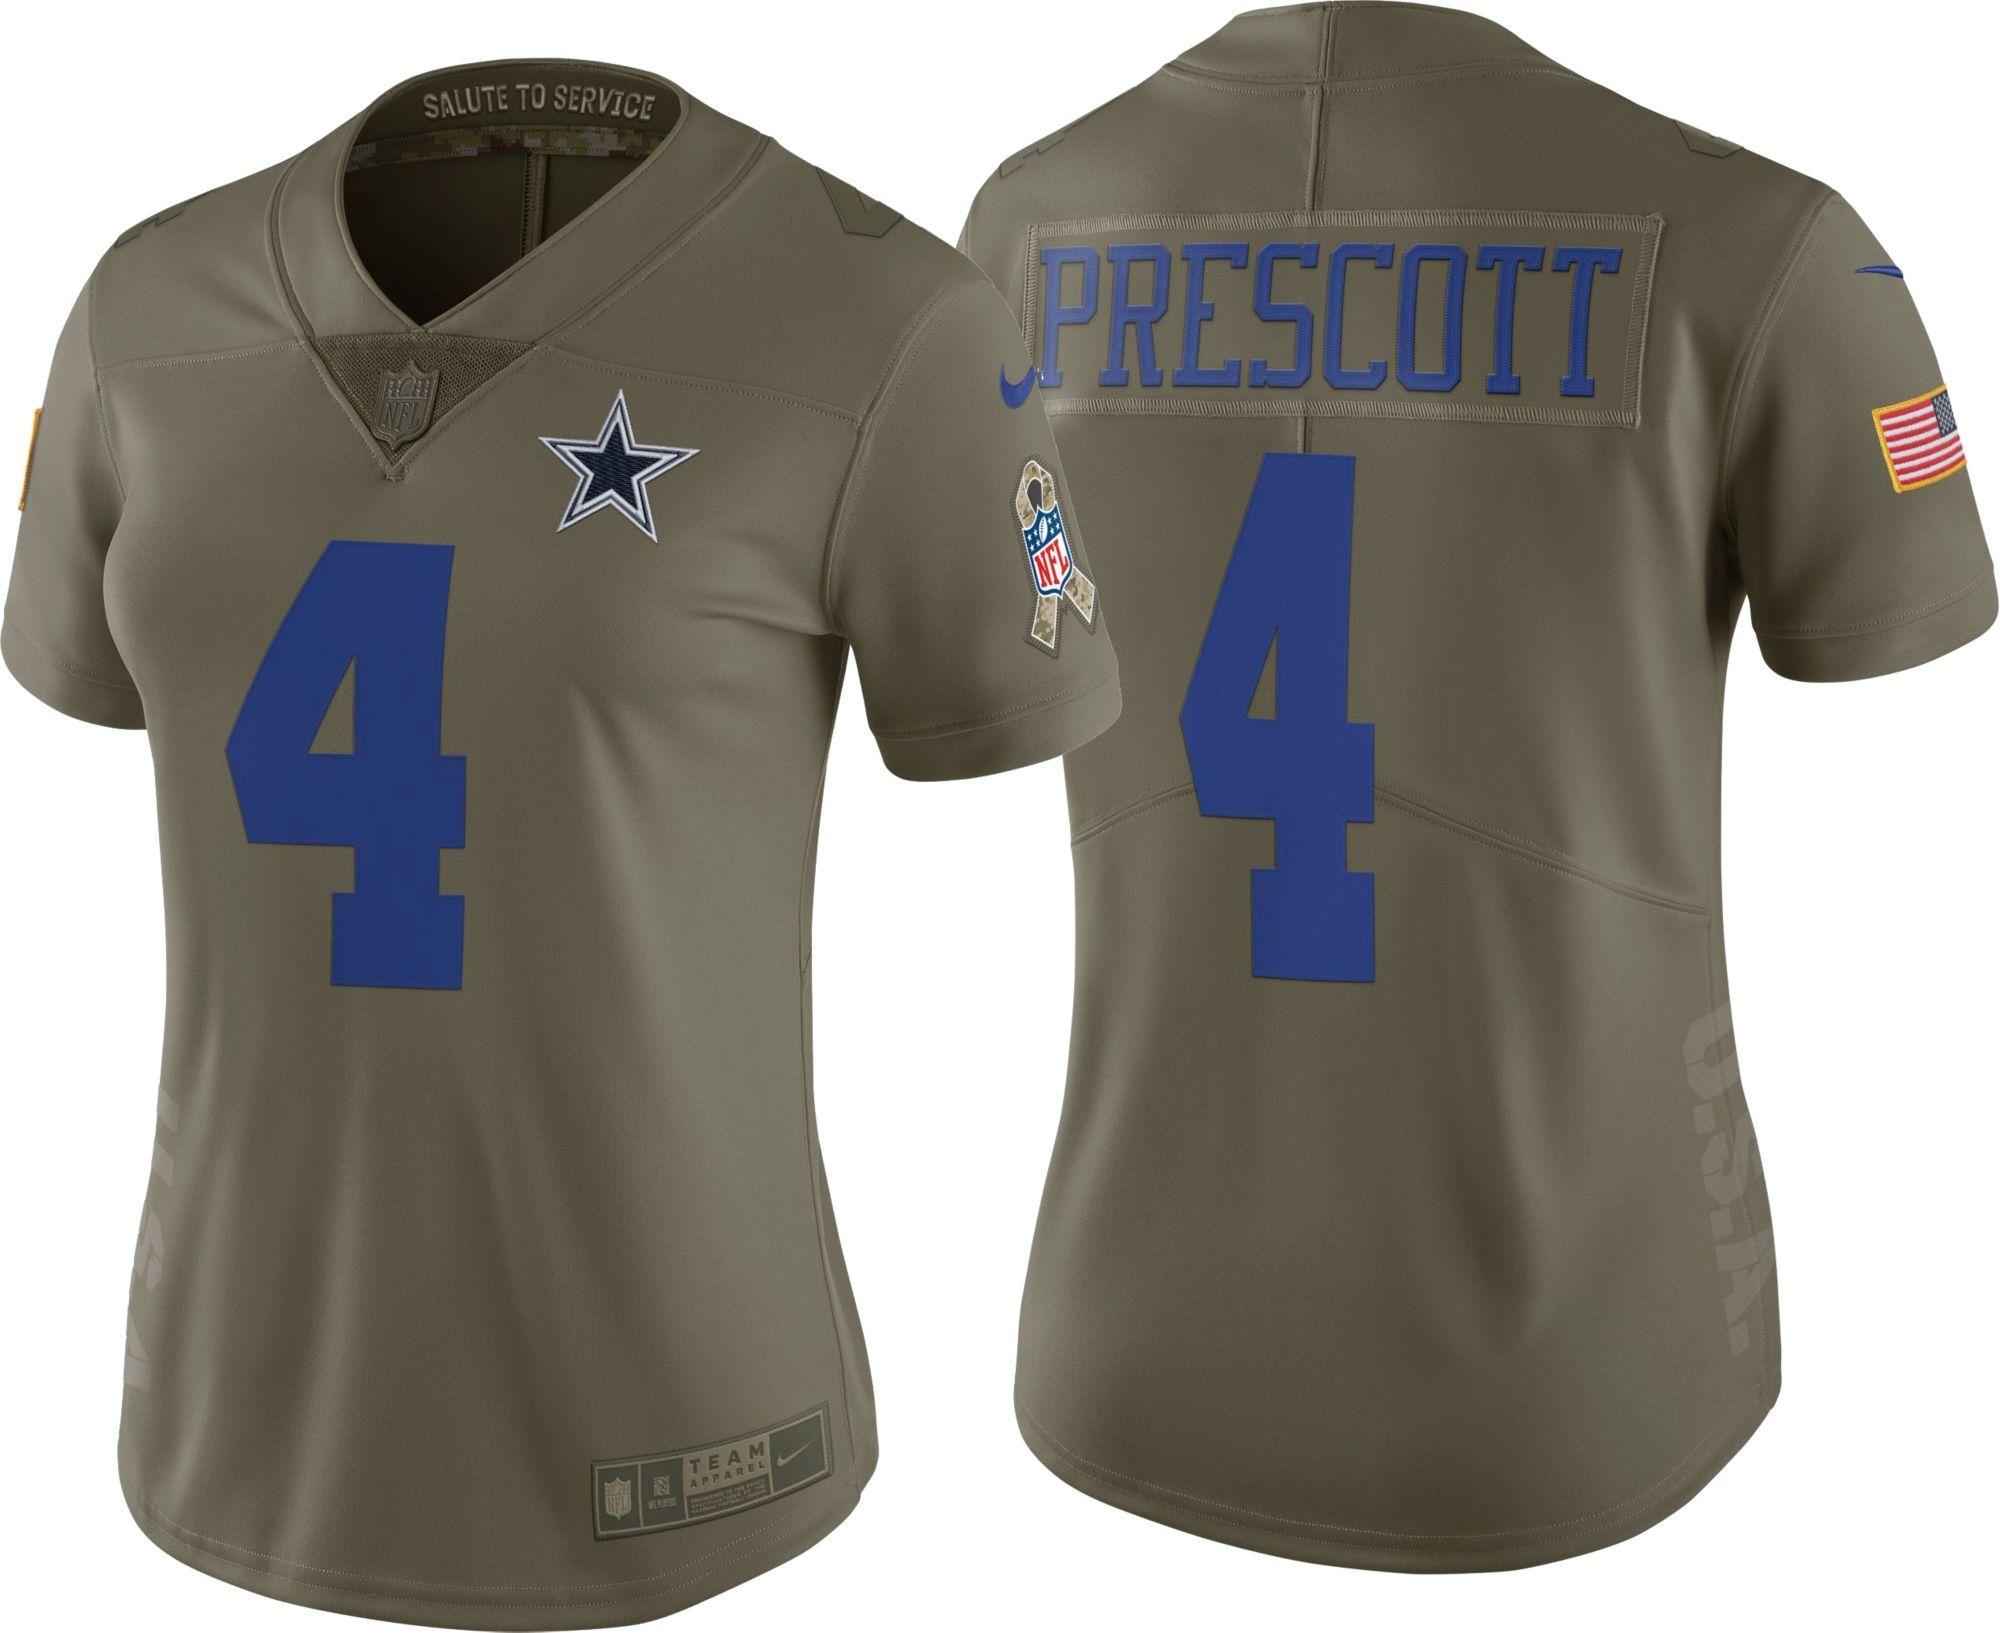 Nike Women's Limited Salute to Service 2017 Dallas Cowboys Dak Prescott #4 Jersey